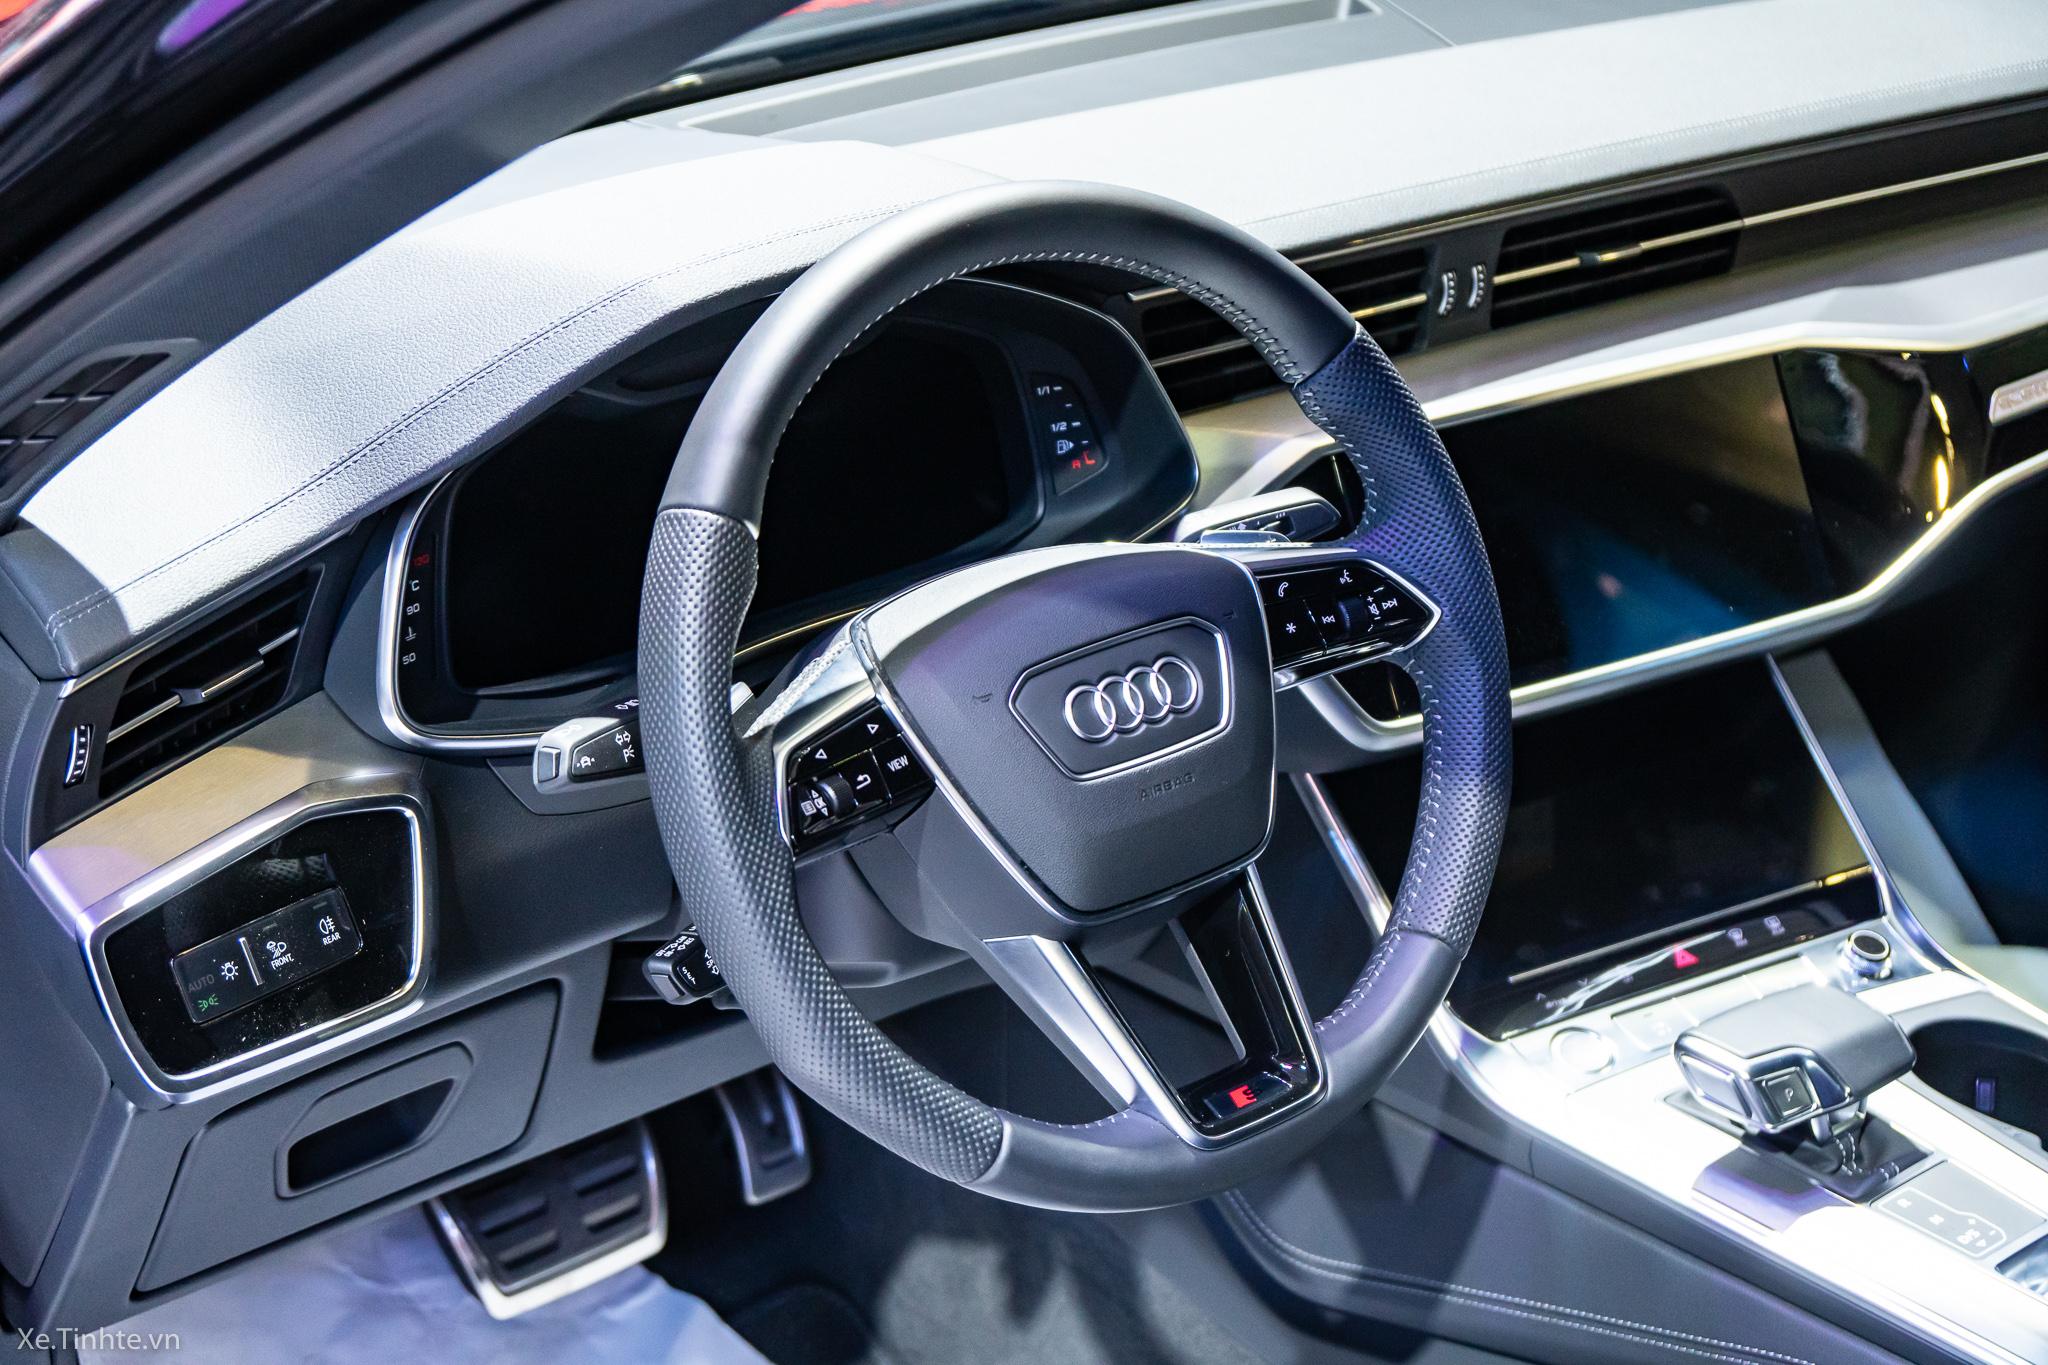 VMS19_Audi_A6-05848.jpg